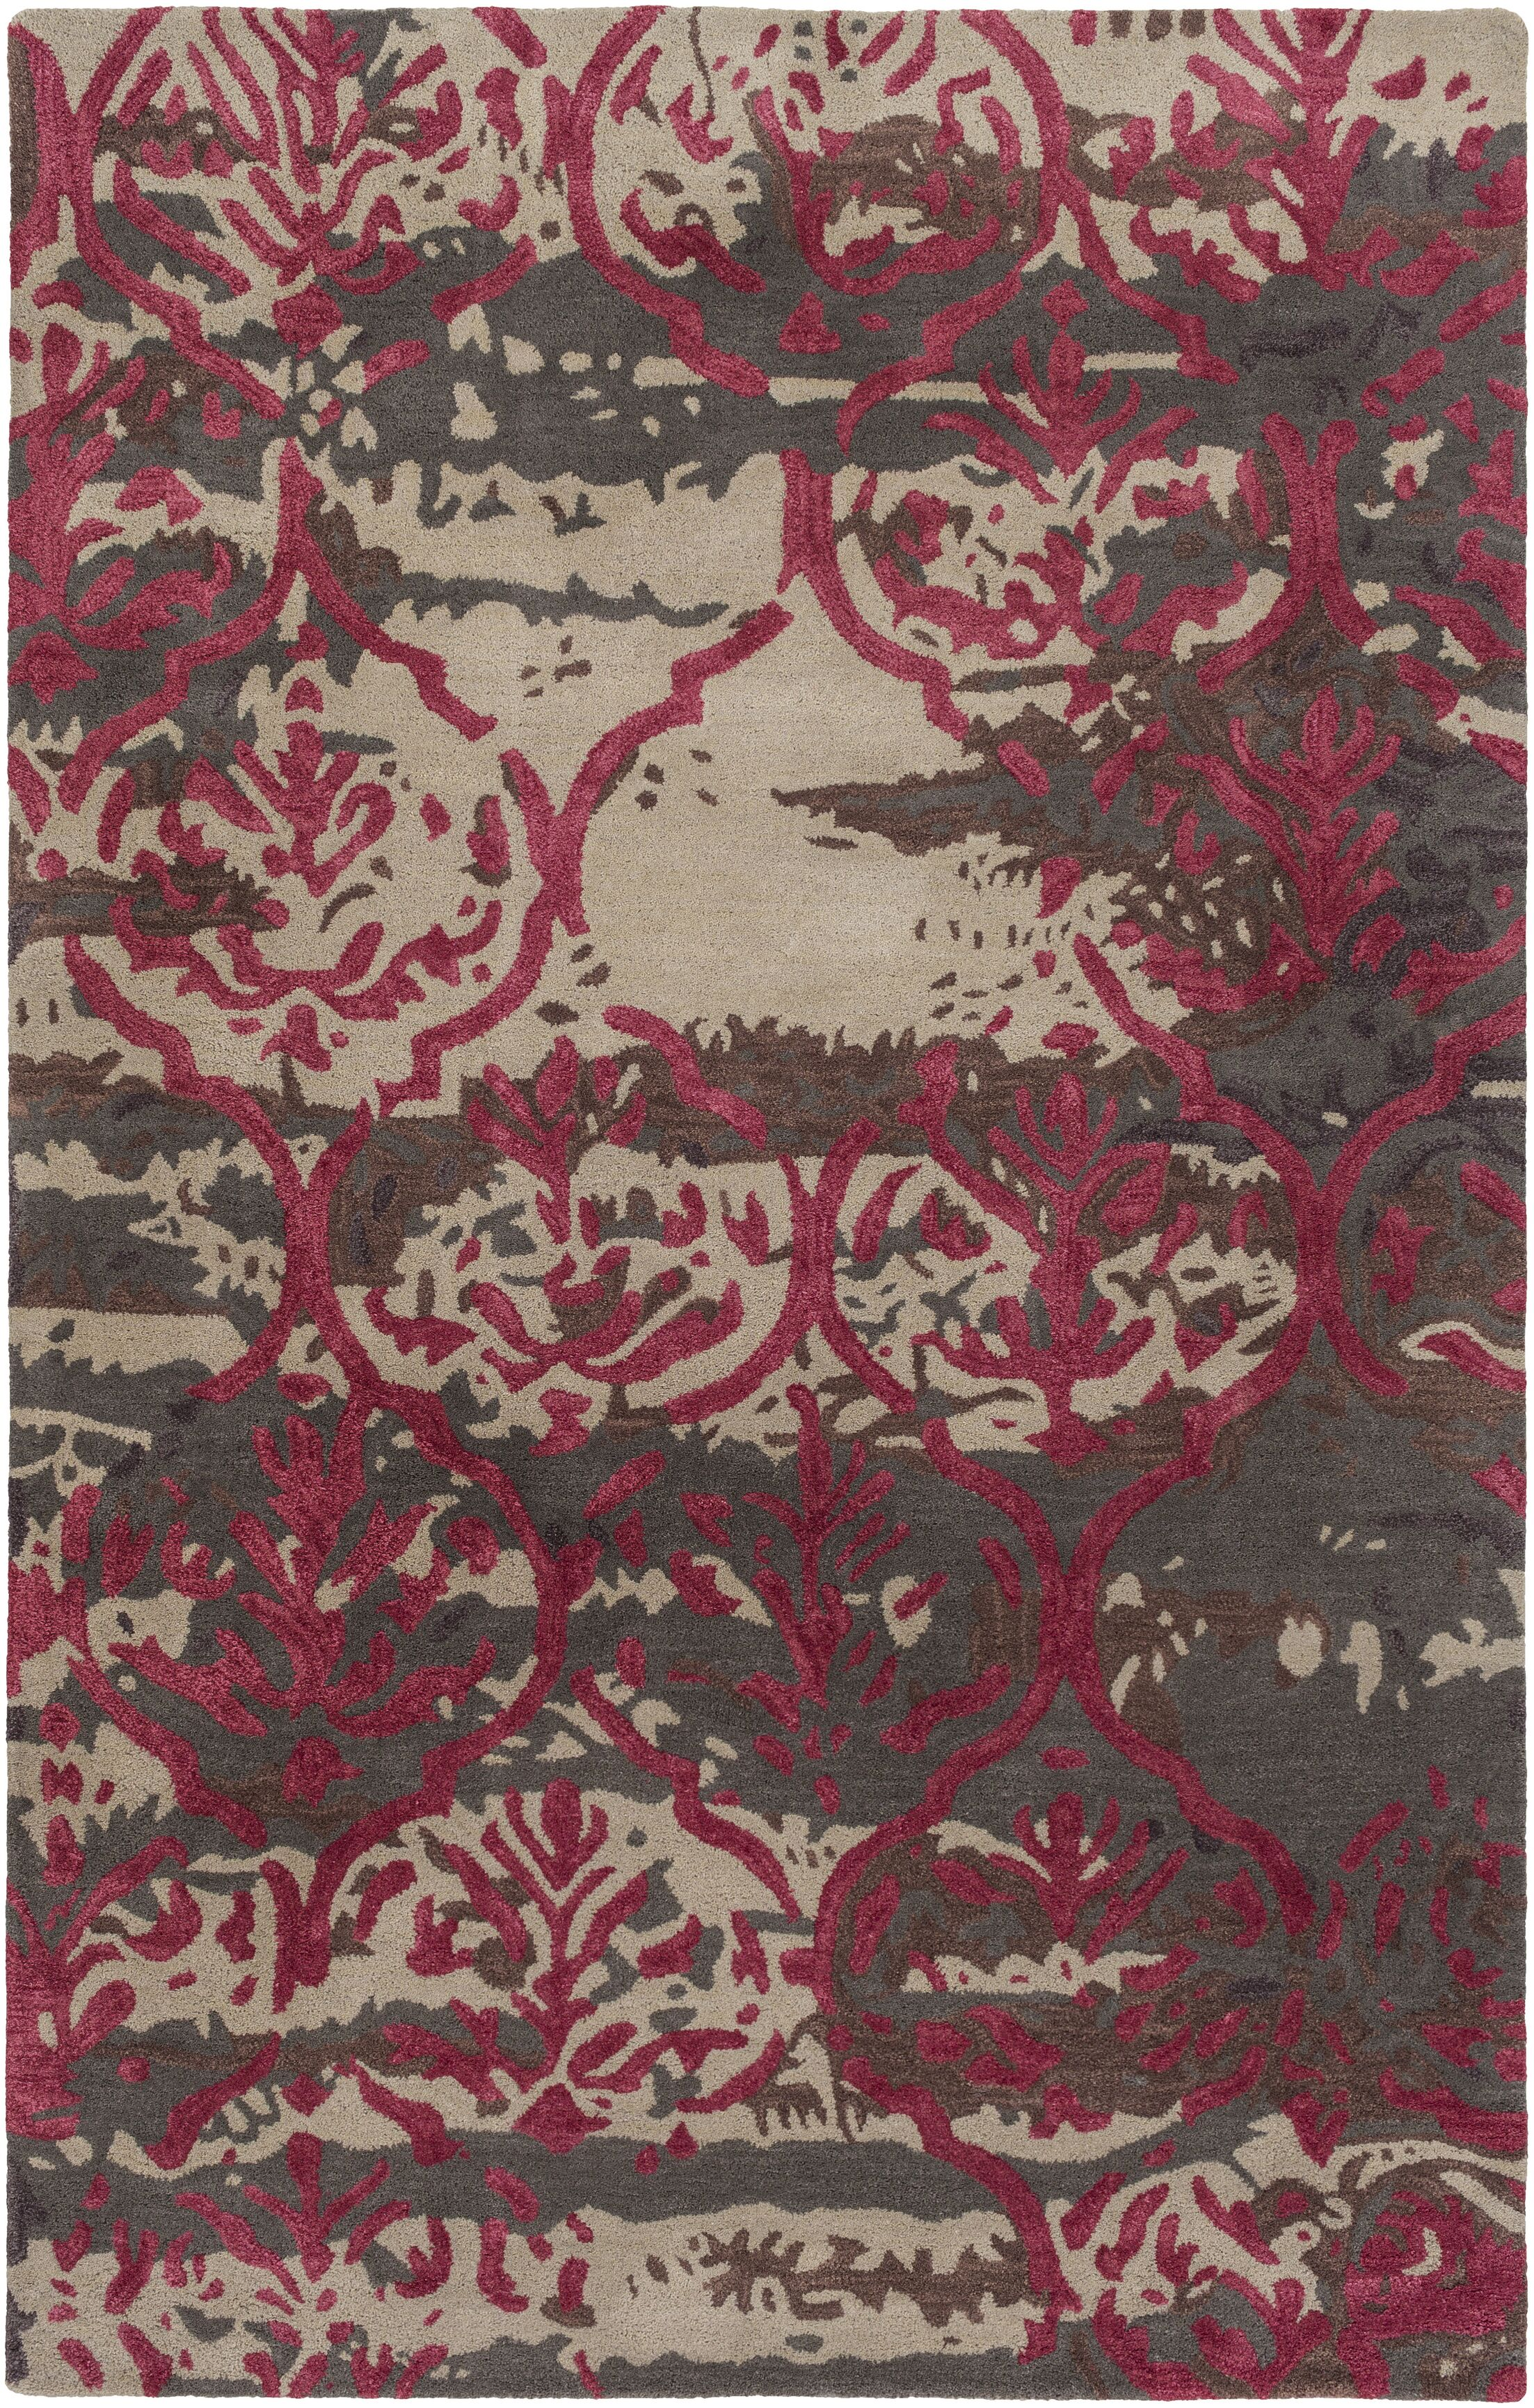 Dilorenzo Hand-Tufted Brown/Burgundy Area Rug Rug Size: Rectangle 9' x 13'